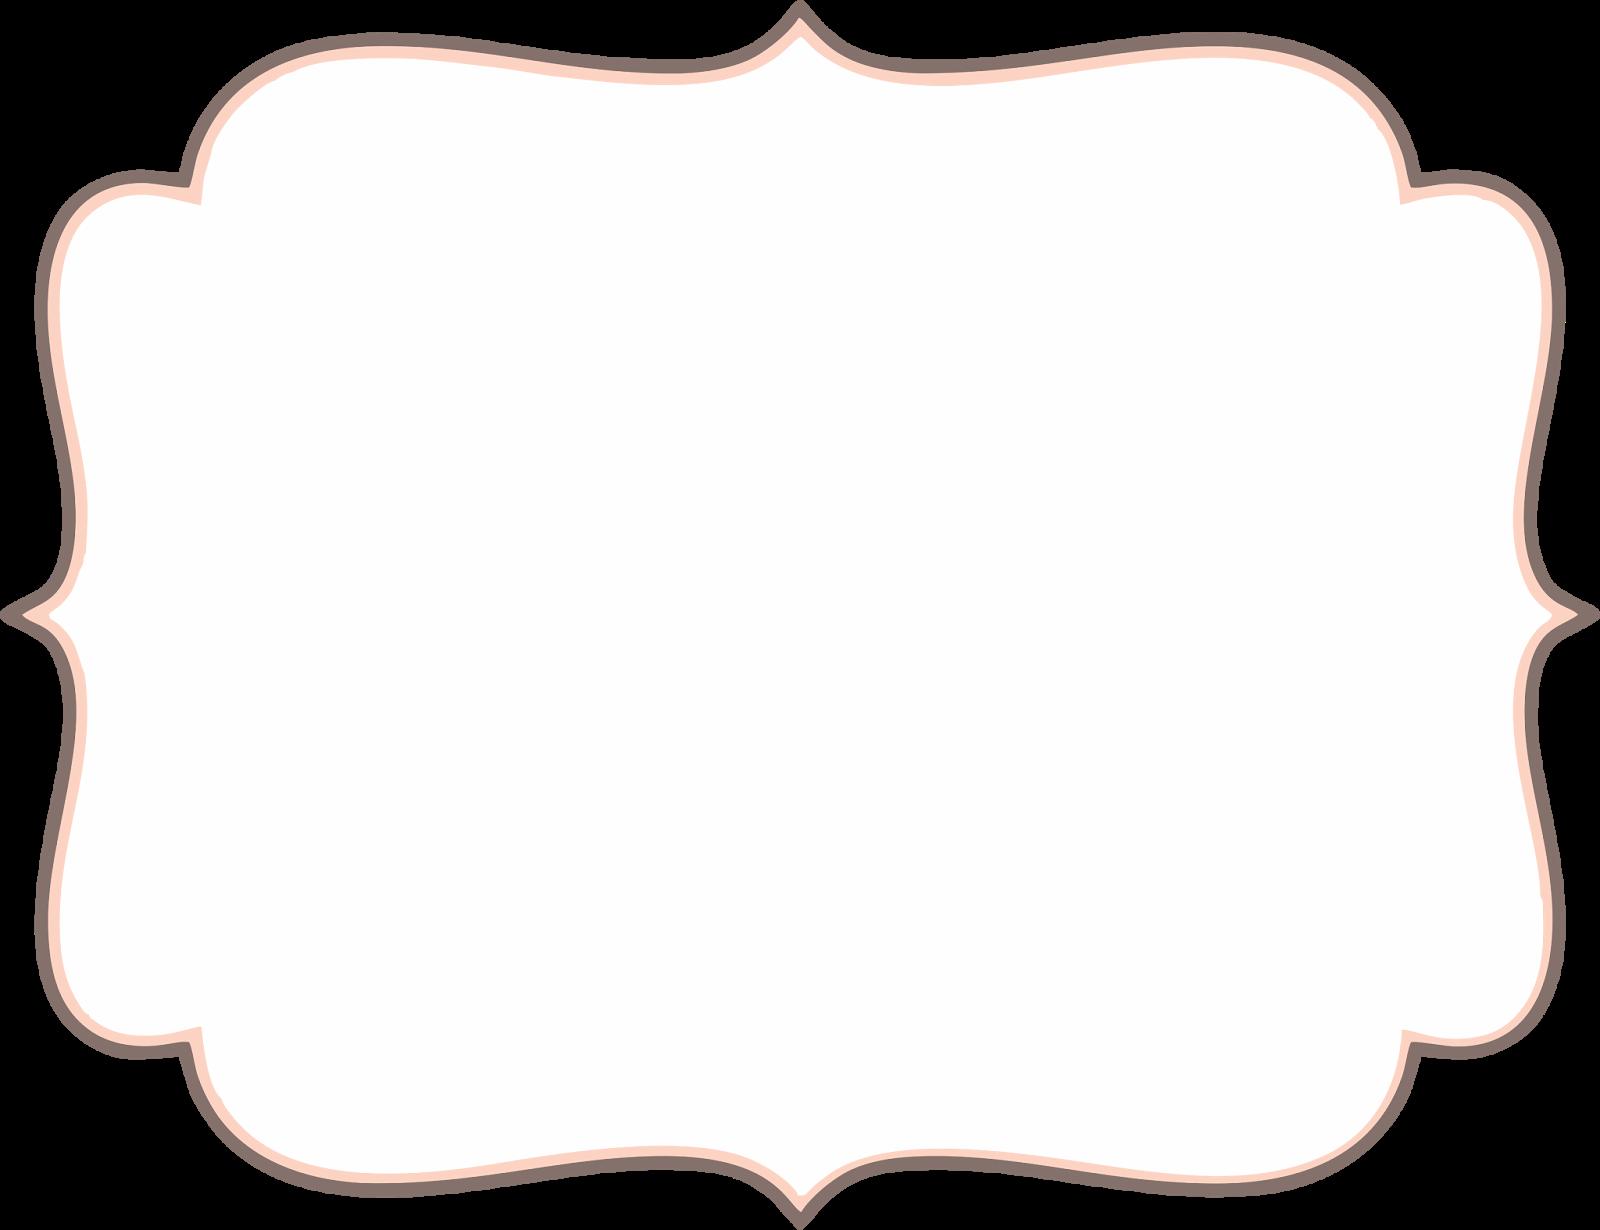 Moldura clipart branca png library download Frames em Png grátis para baixar   Clipart   Molduras vetor ... png library download